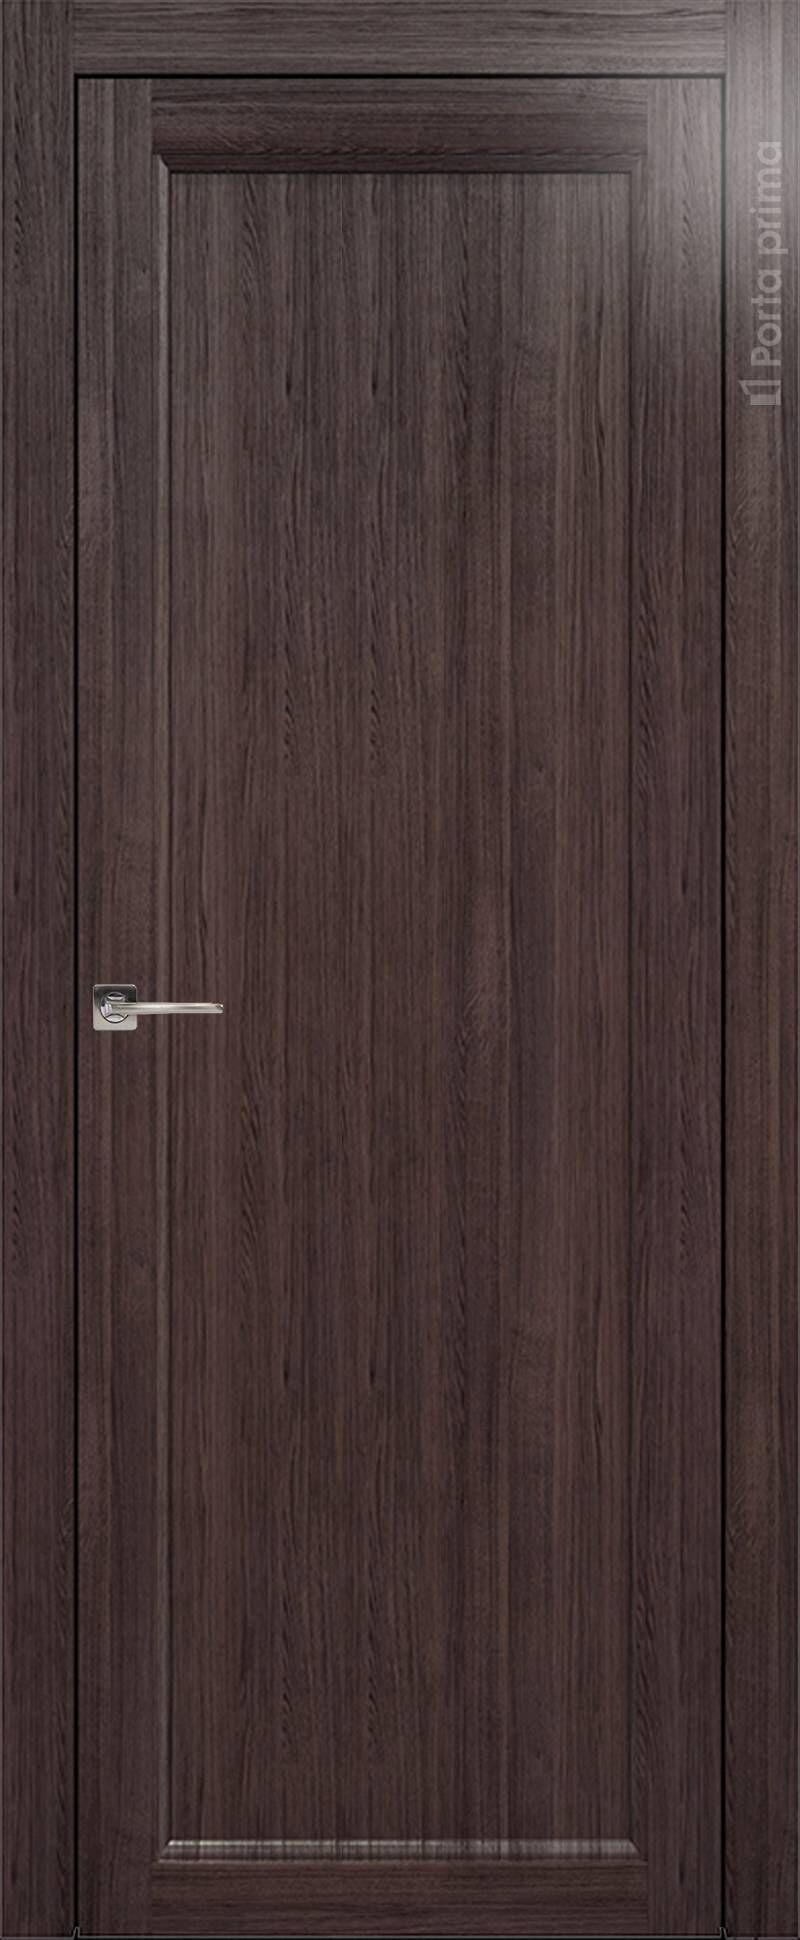 Sorrento-R А4 цвет - Венге Нуар Без стекла (ДГ)